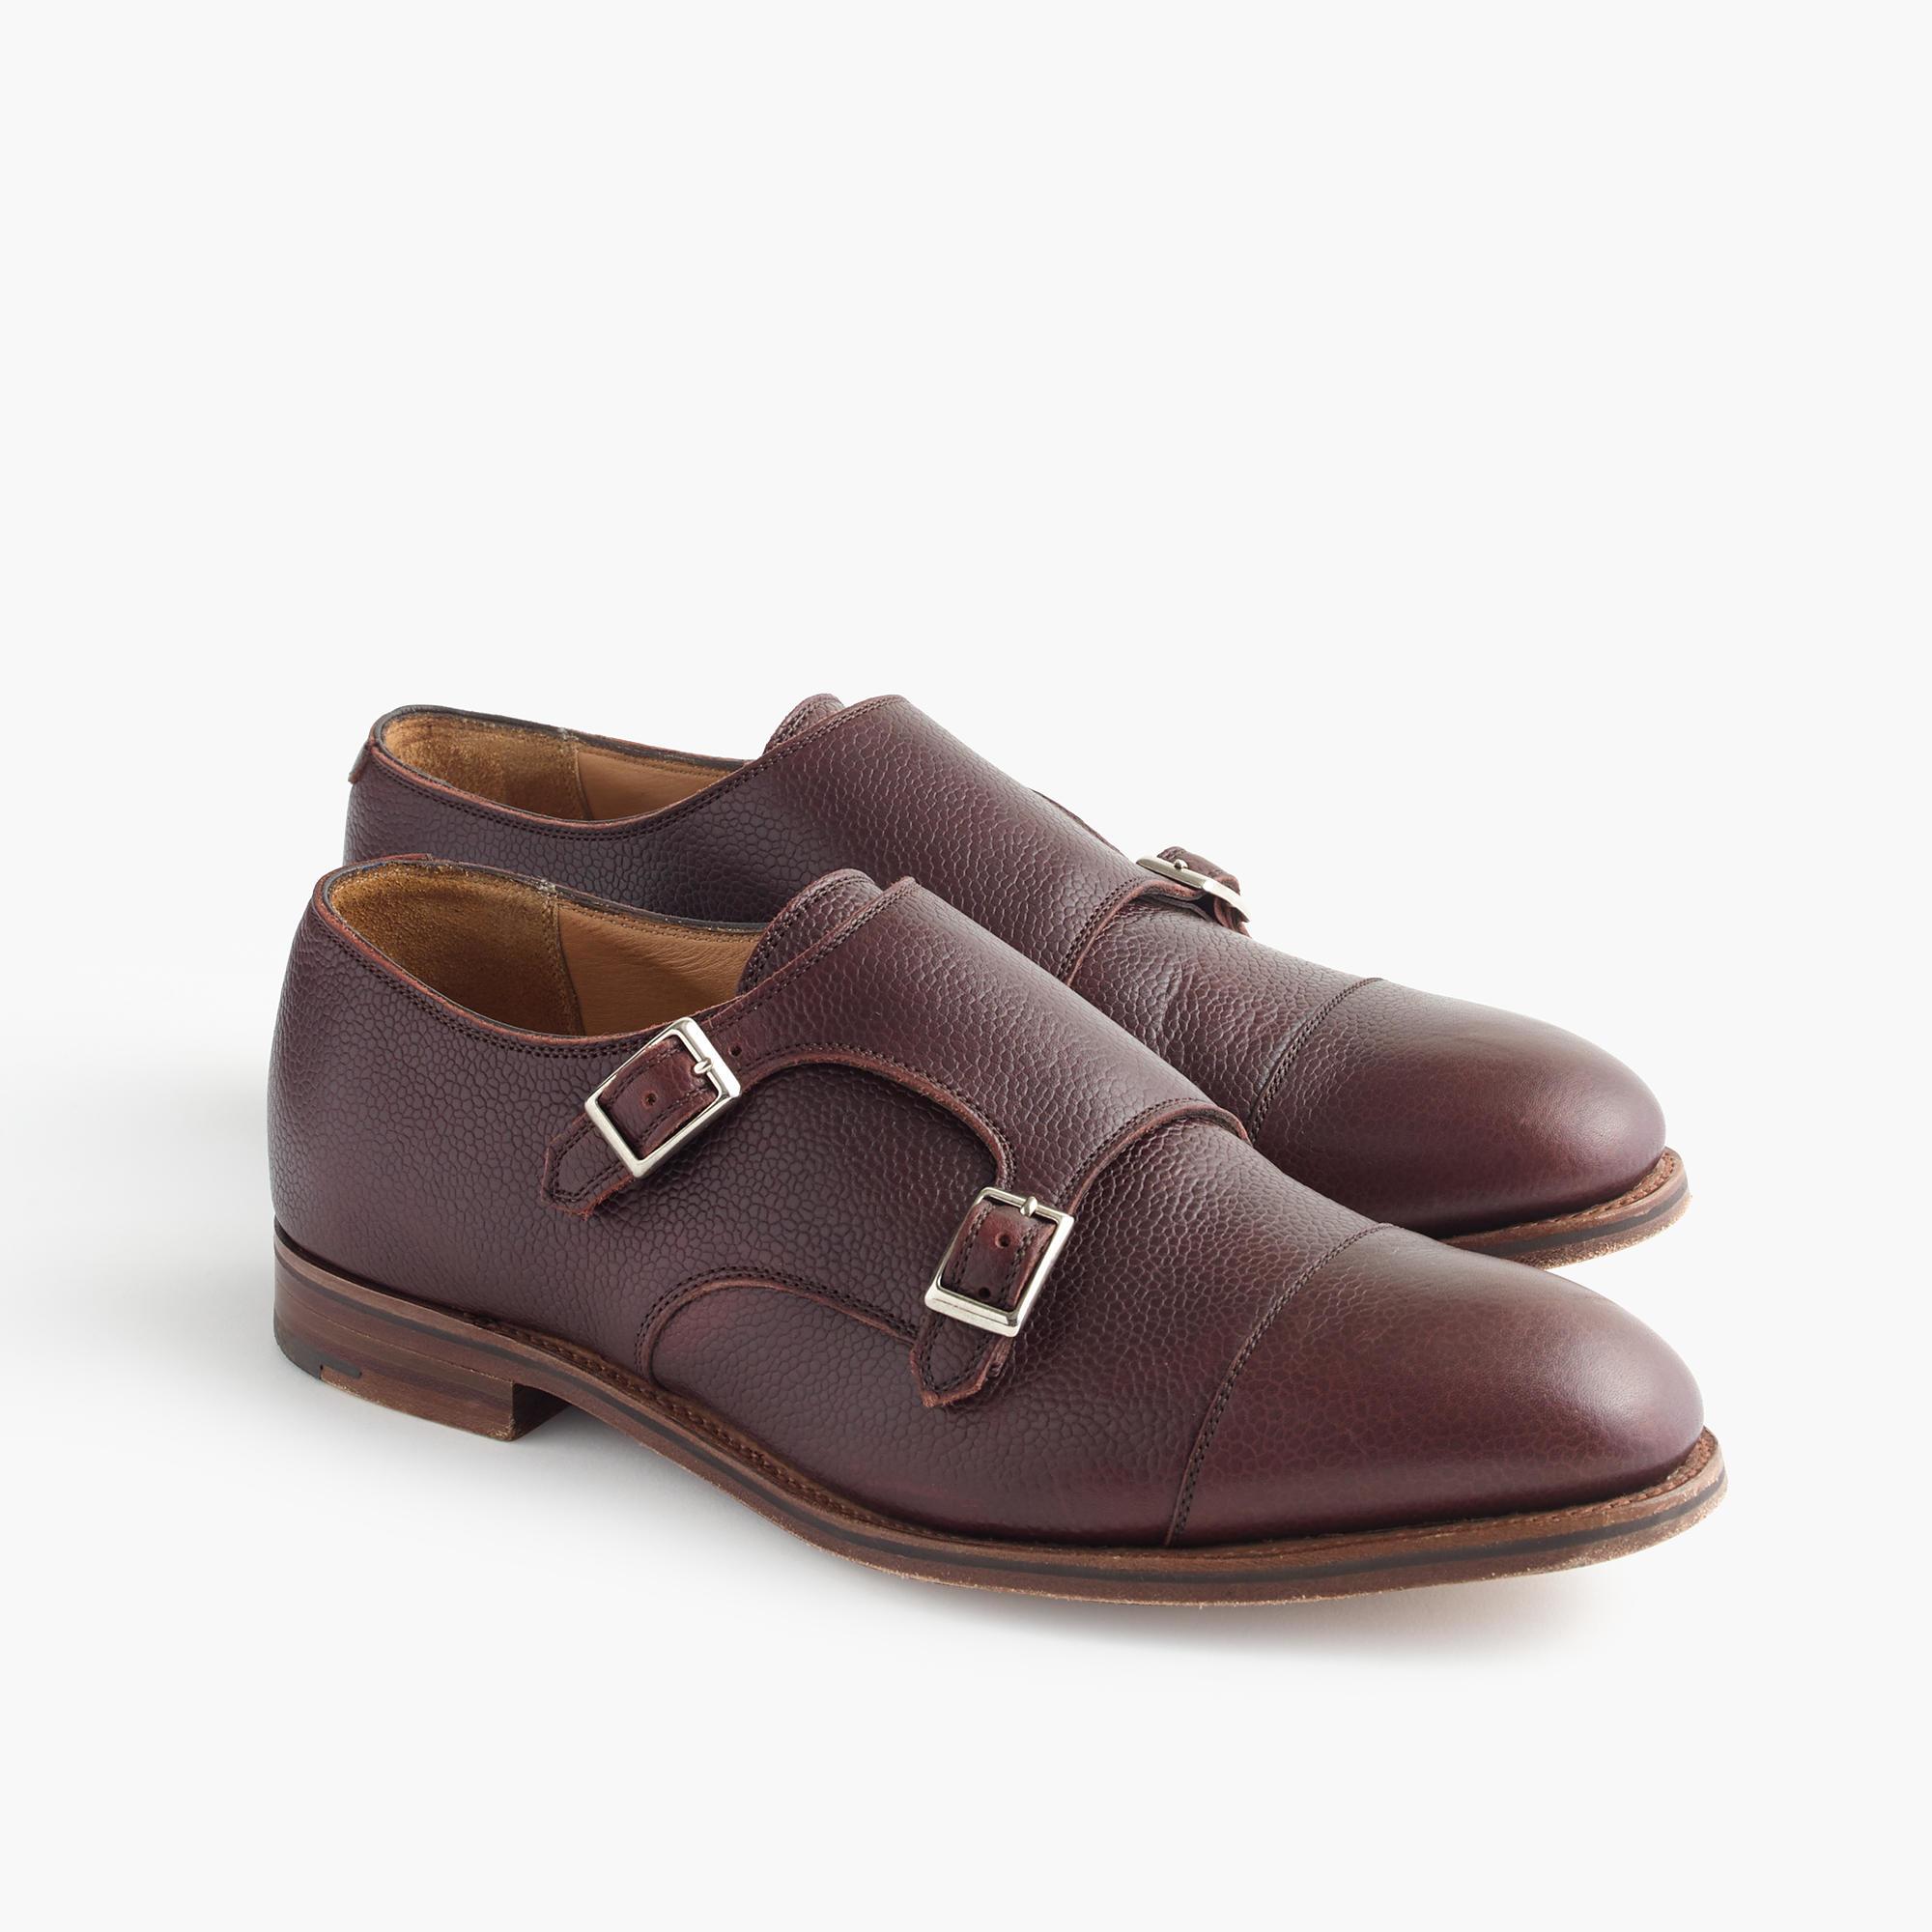 Ben Sherman Italian Leather Shoes